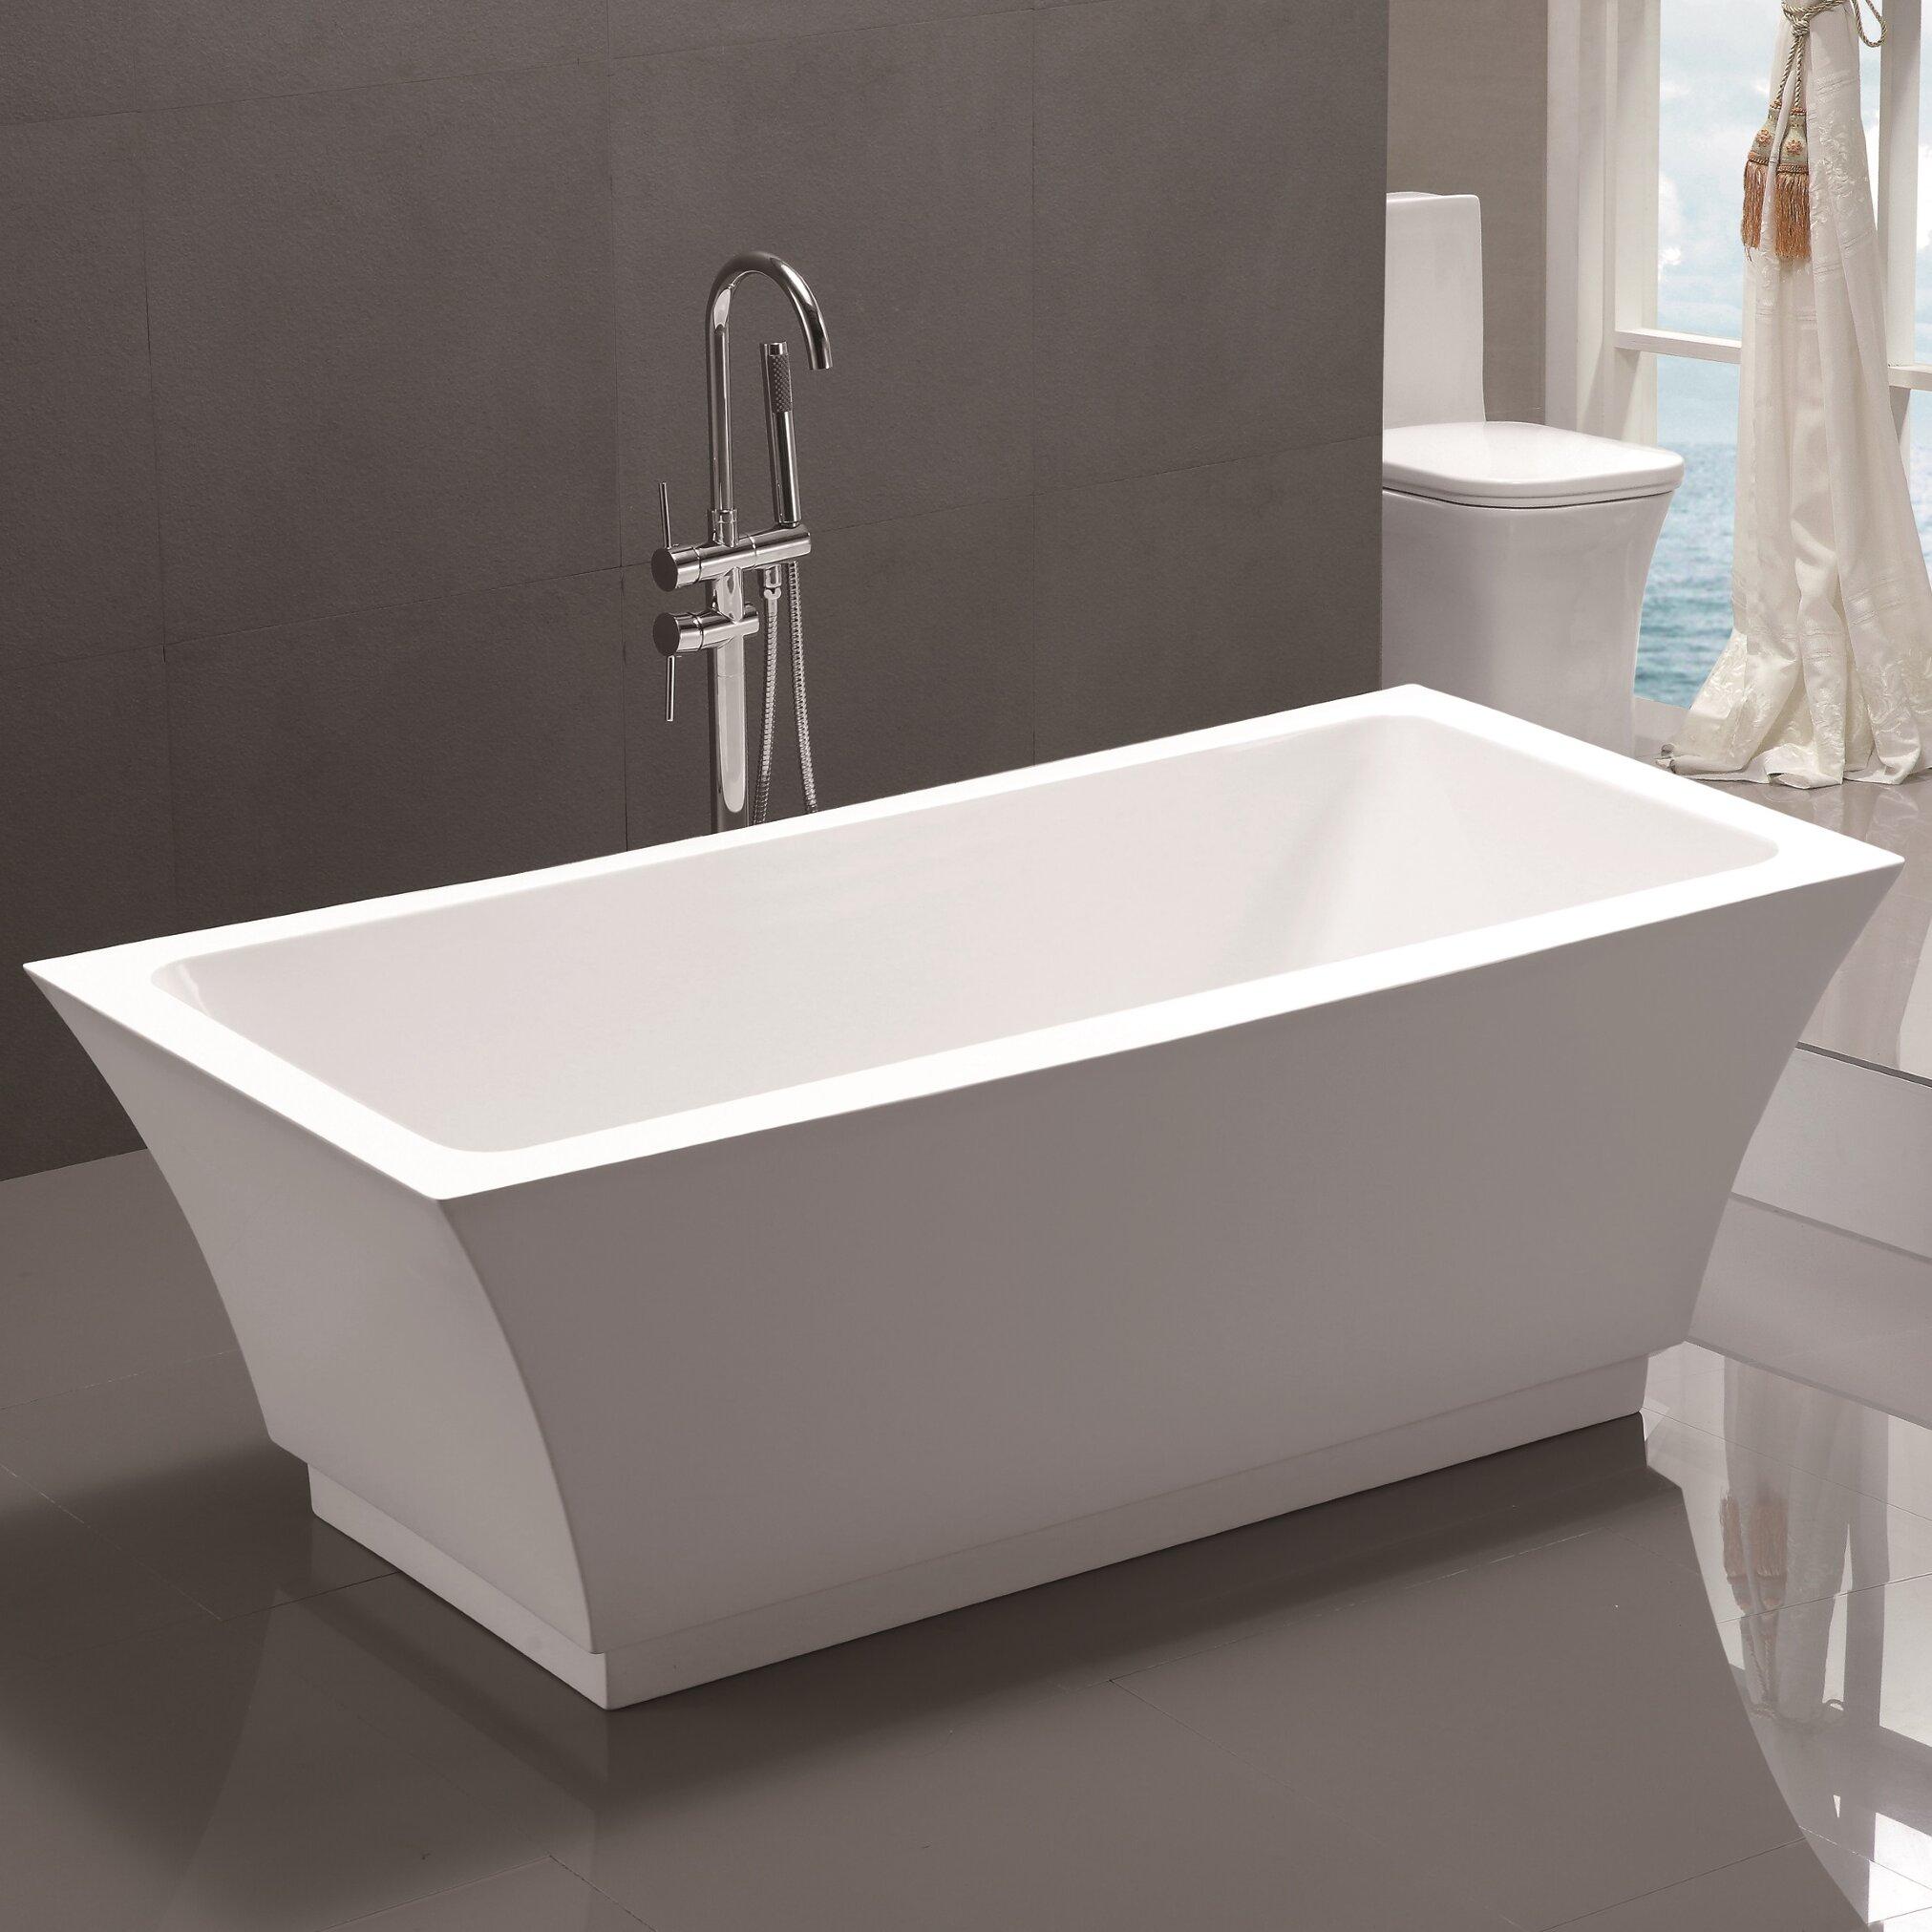 "Vanityart 59"" X 29.5"" Freestanding Soaking Bathtub"